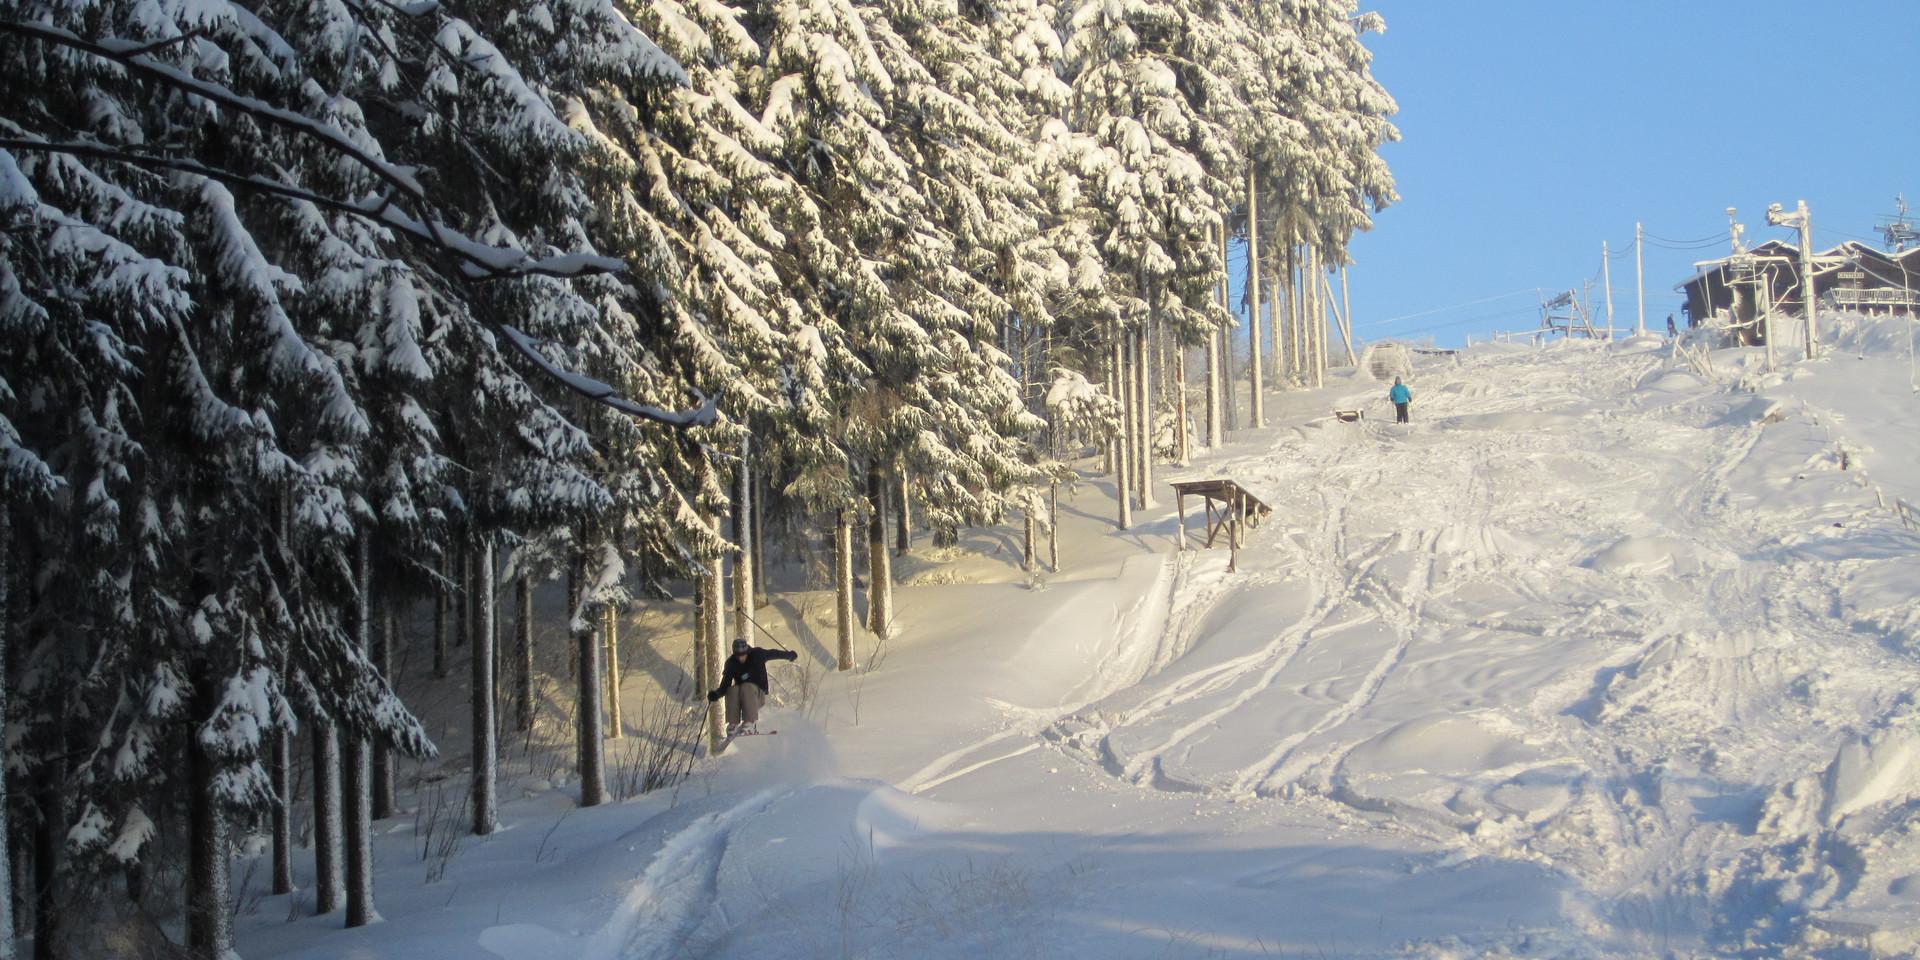 Ski-alpin-Ovifat_1